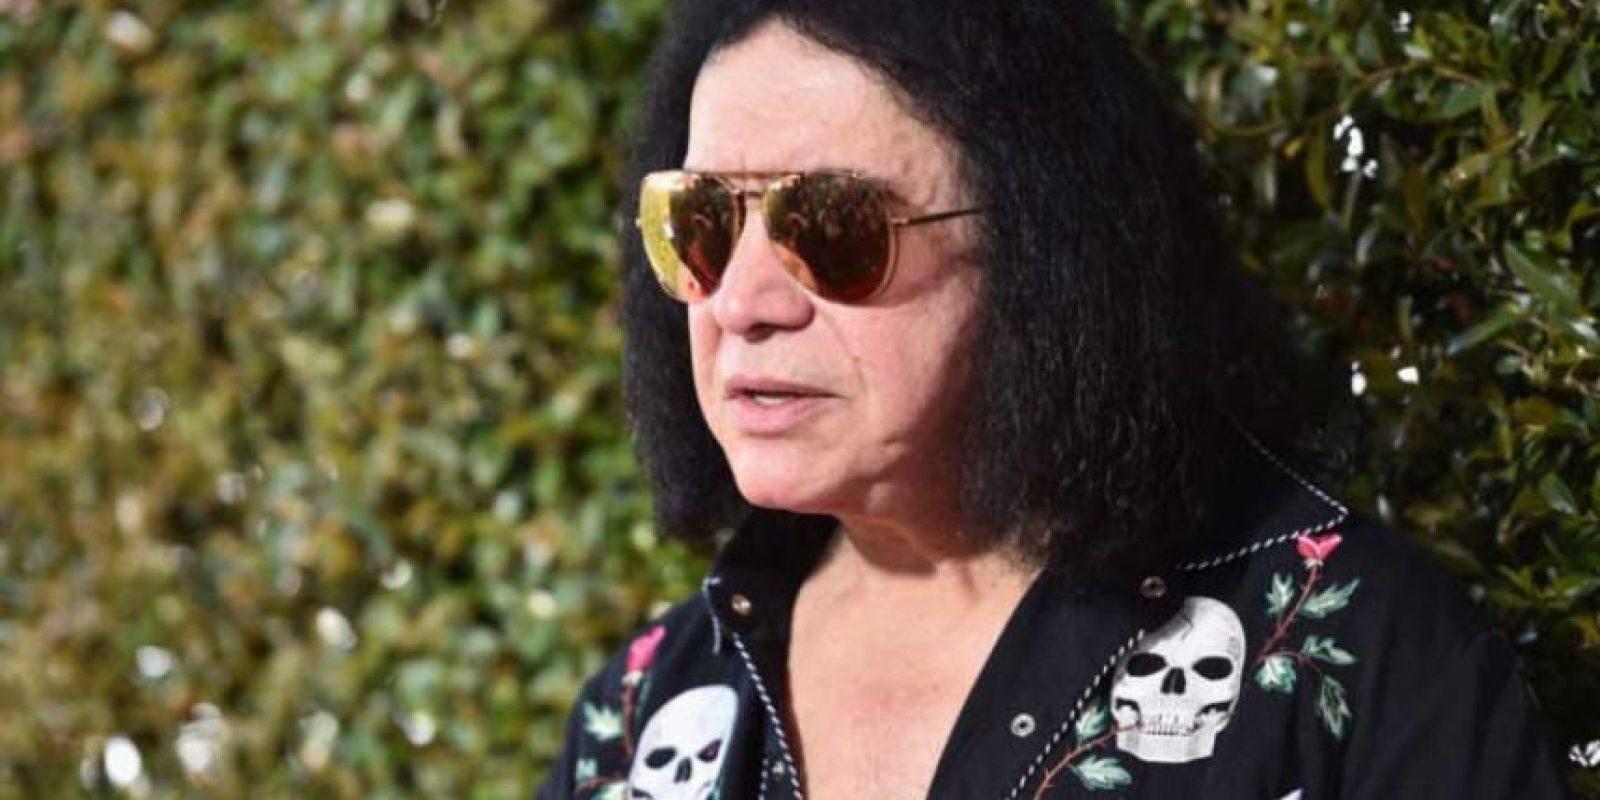 El bajista de Kiss se ganó el despreció de los usuarios de las redes sociales. Foto:Getty Images